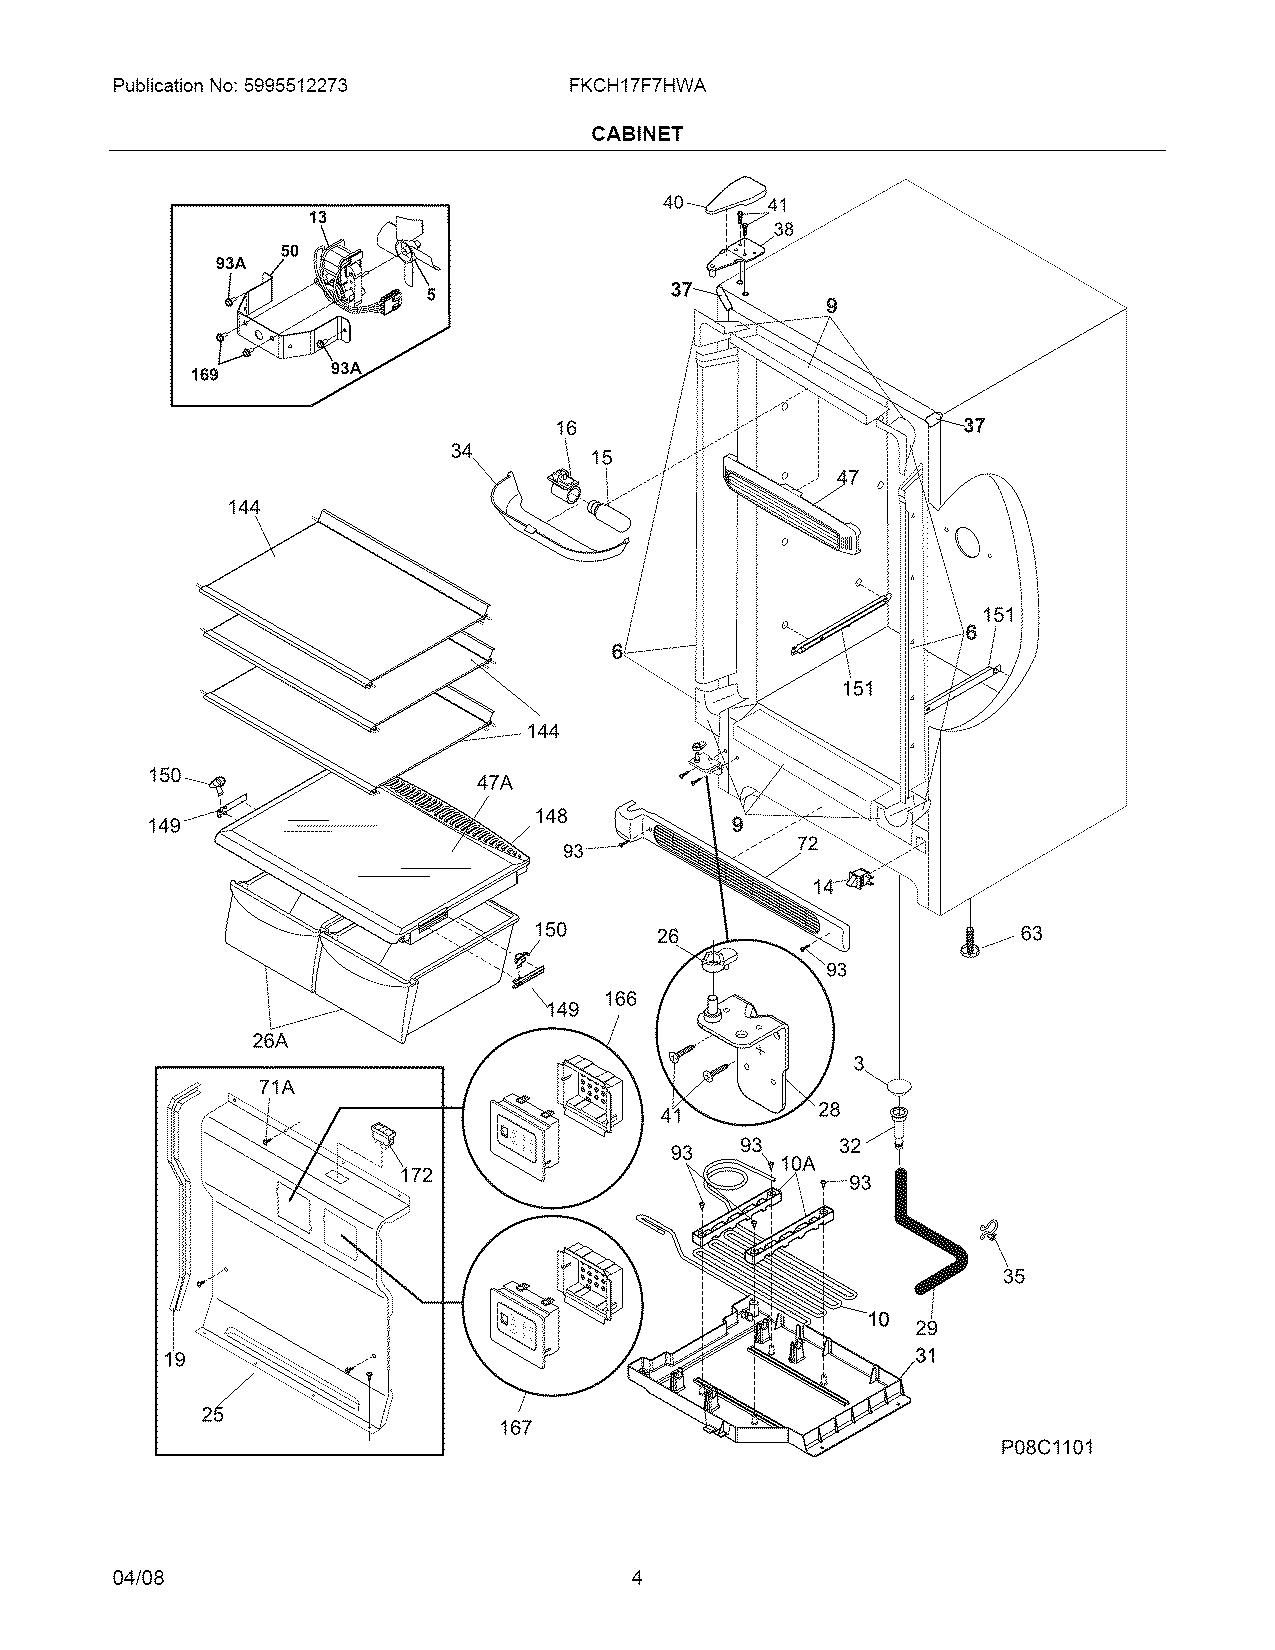 CABINET Diagram & Parts List for Model fkch17f7hwa